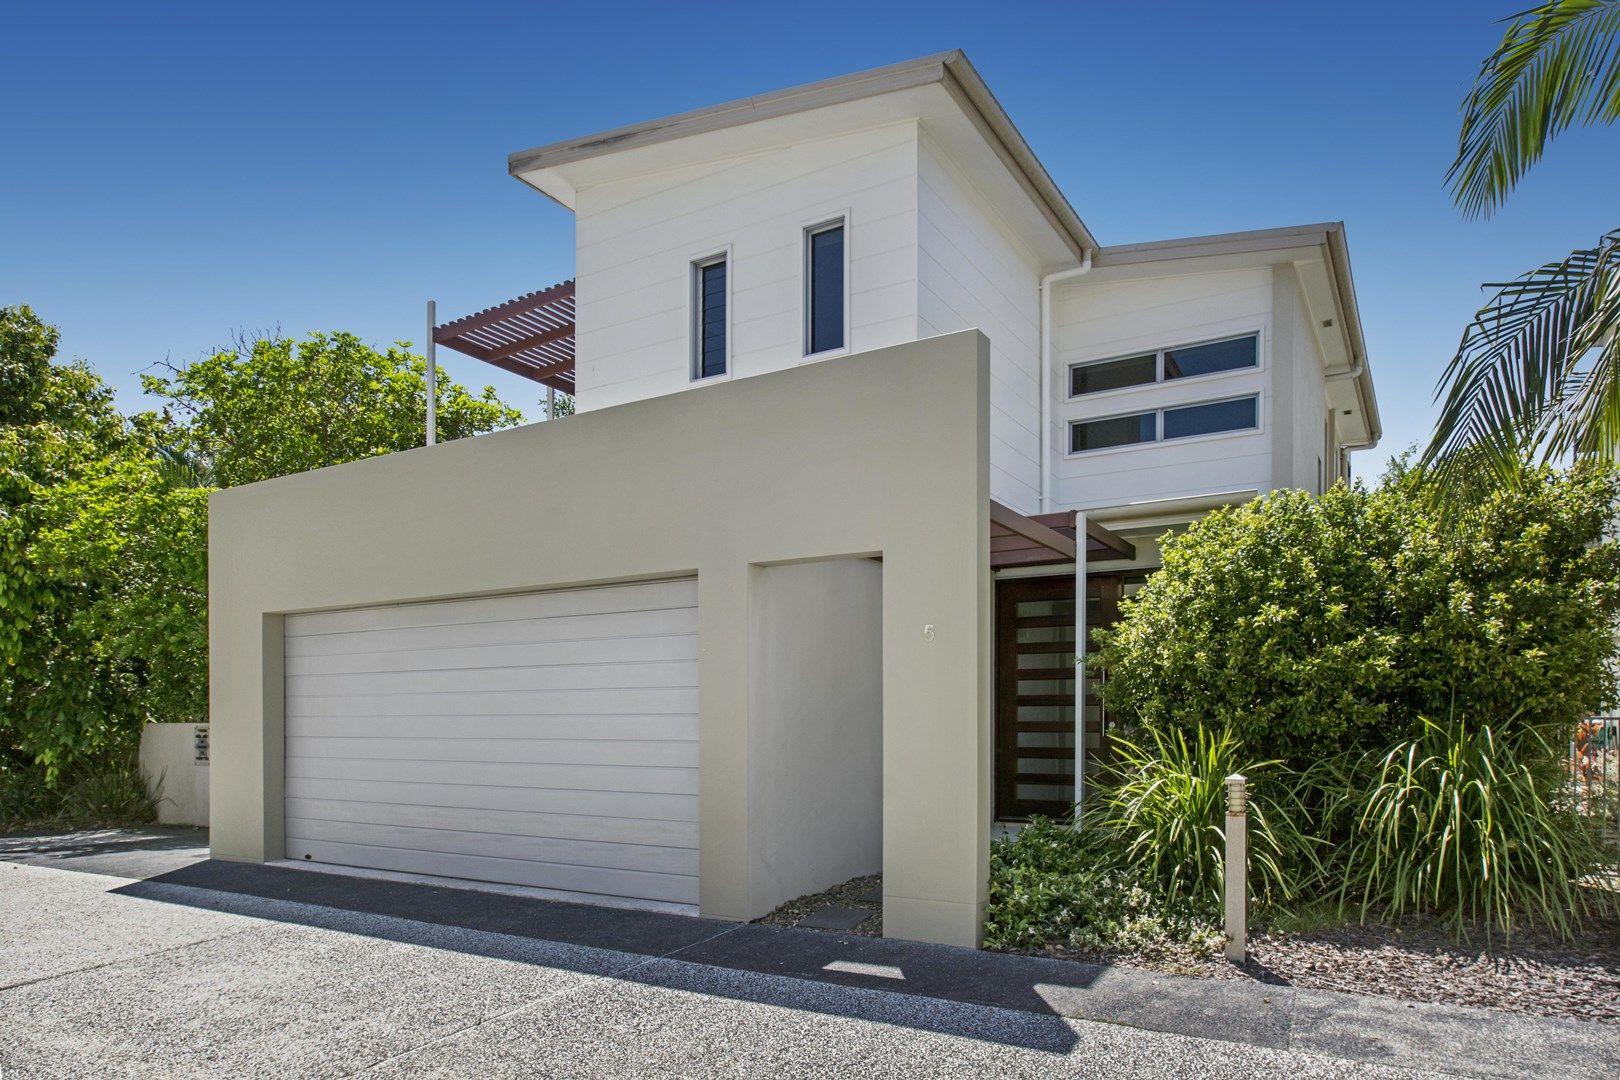 5/21 Hilton Terrace, Tewantin QLD 4565, Image 0